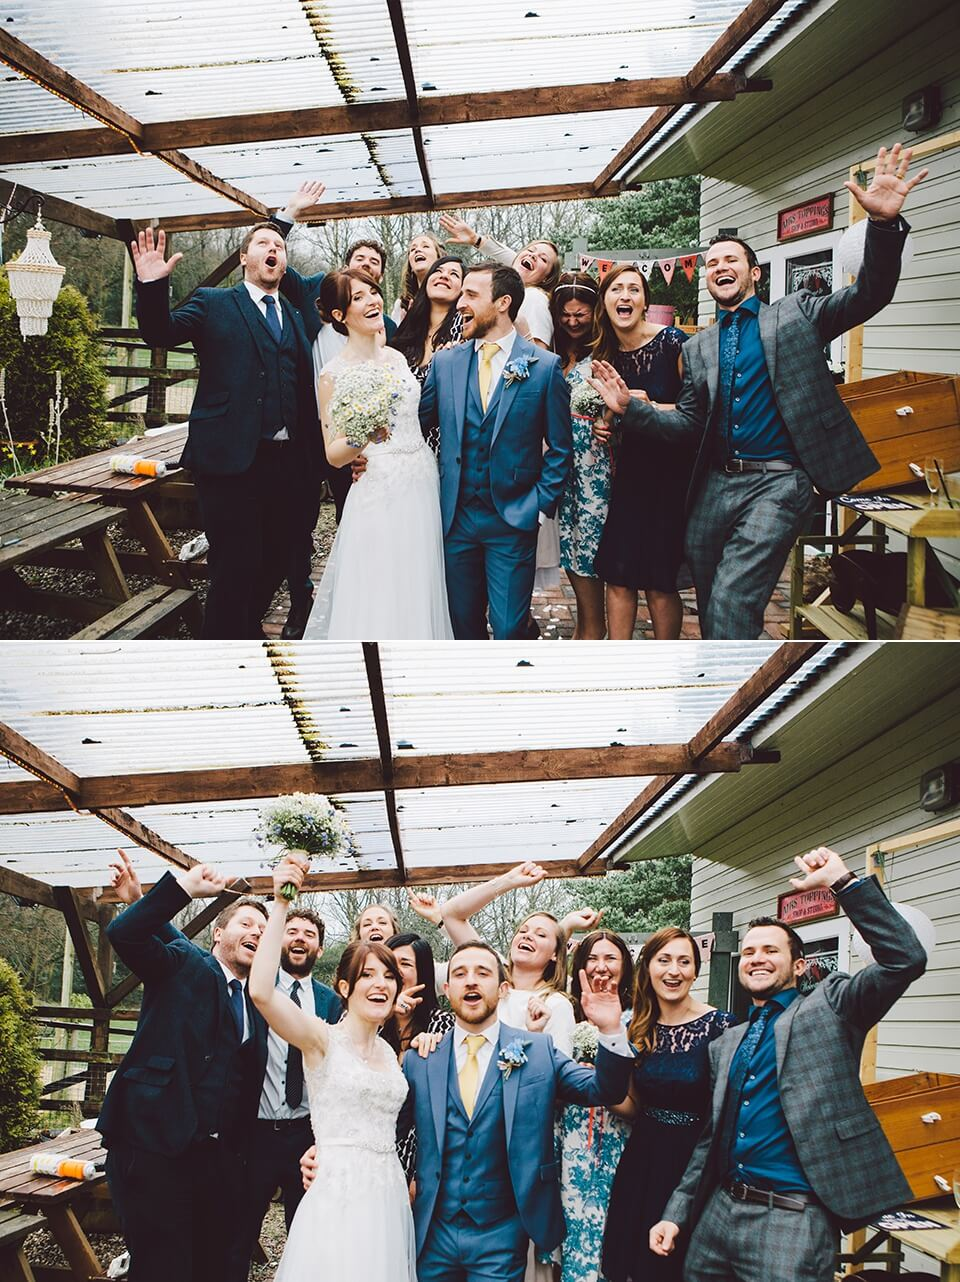 Fun Wedding Formals Portrait Photography Rainbow Themed Wedding in the Rain